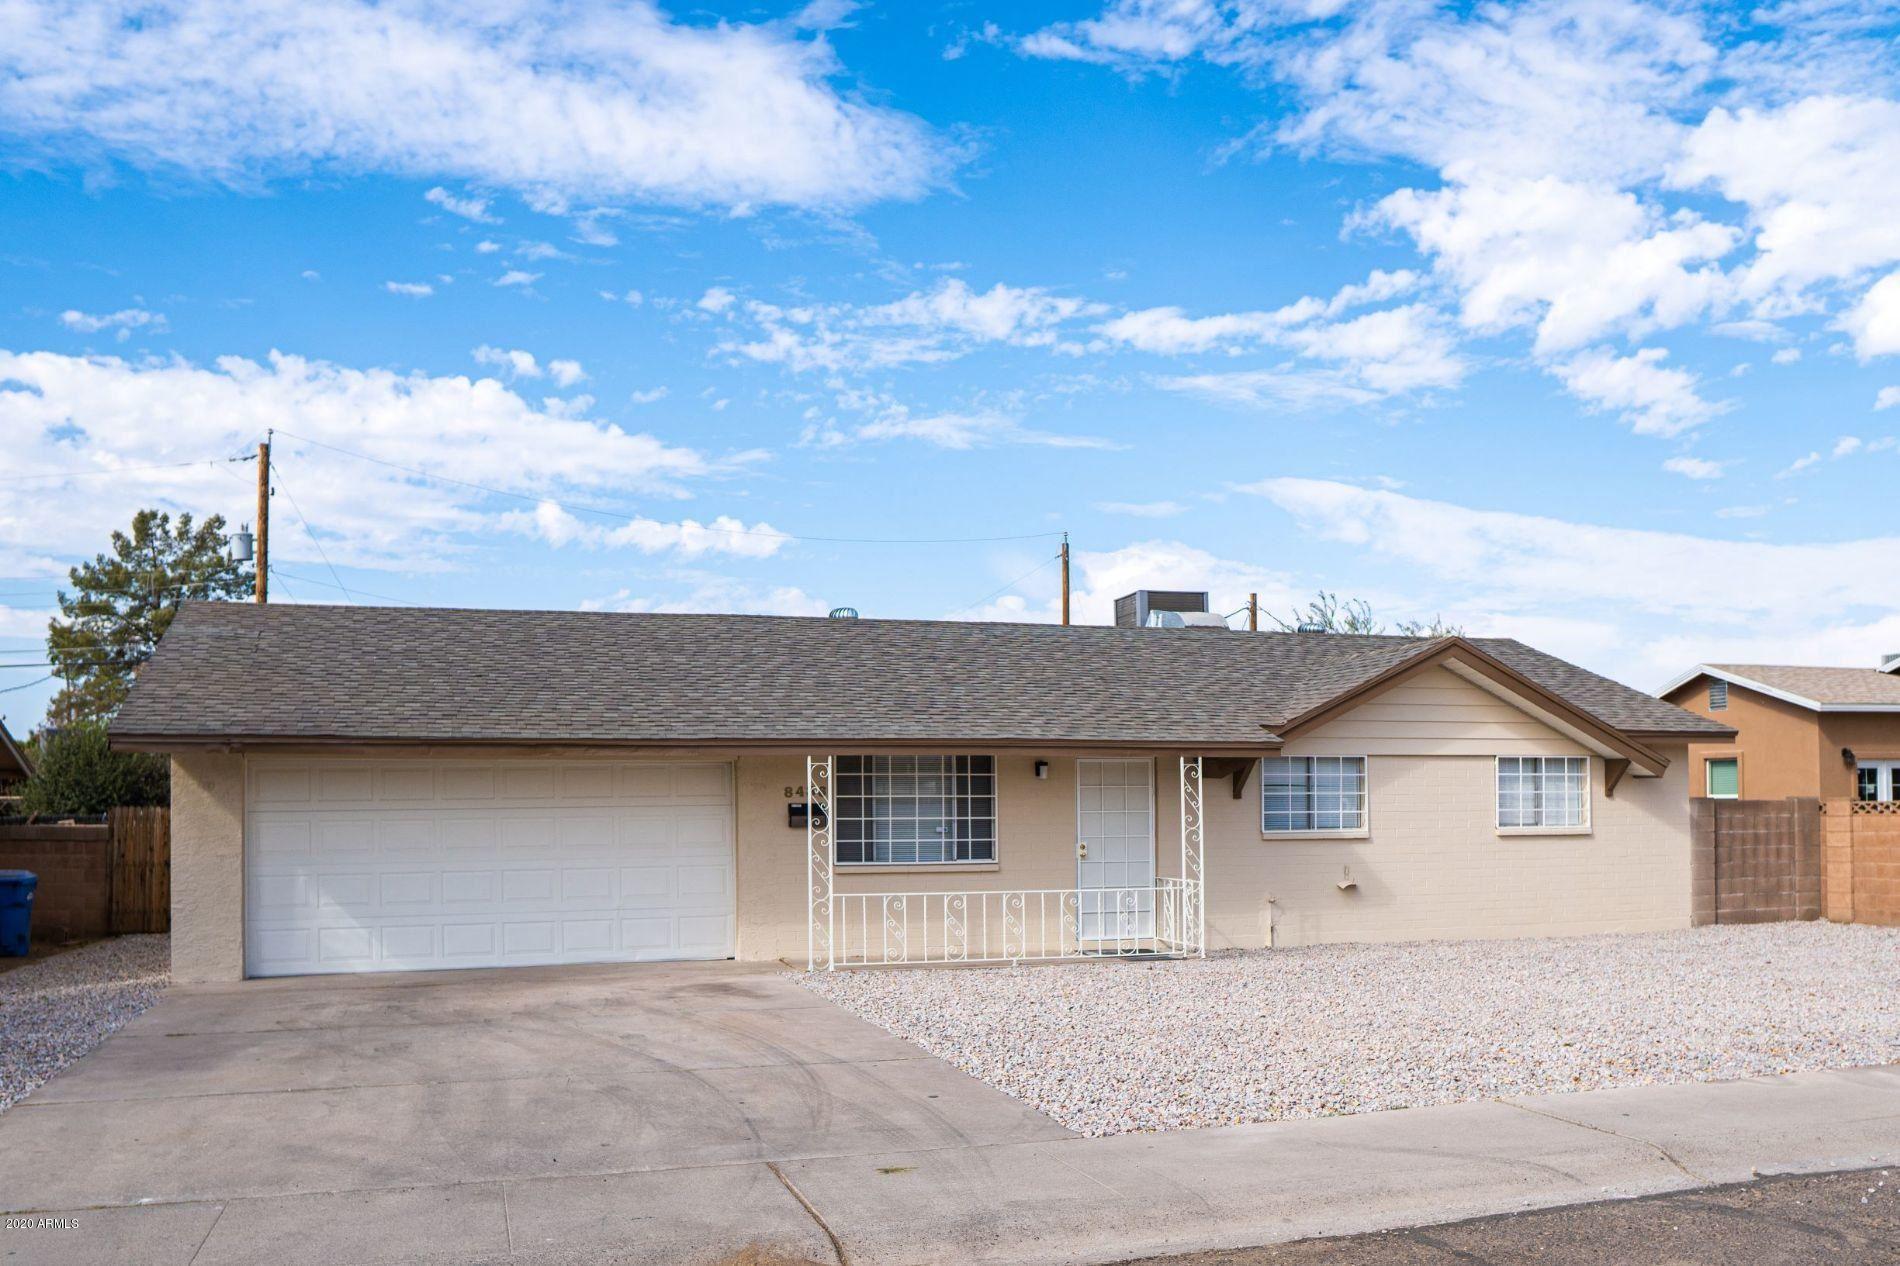 8436 N 35TH Avenue, Phoenix, AZ 85051 - MLS#: 6164950